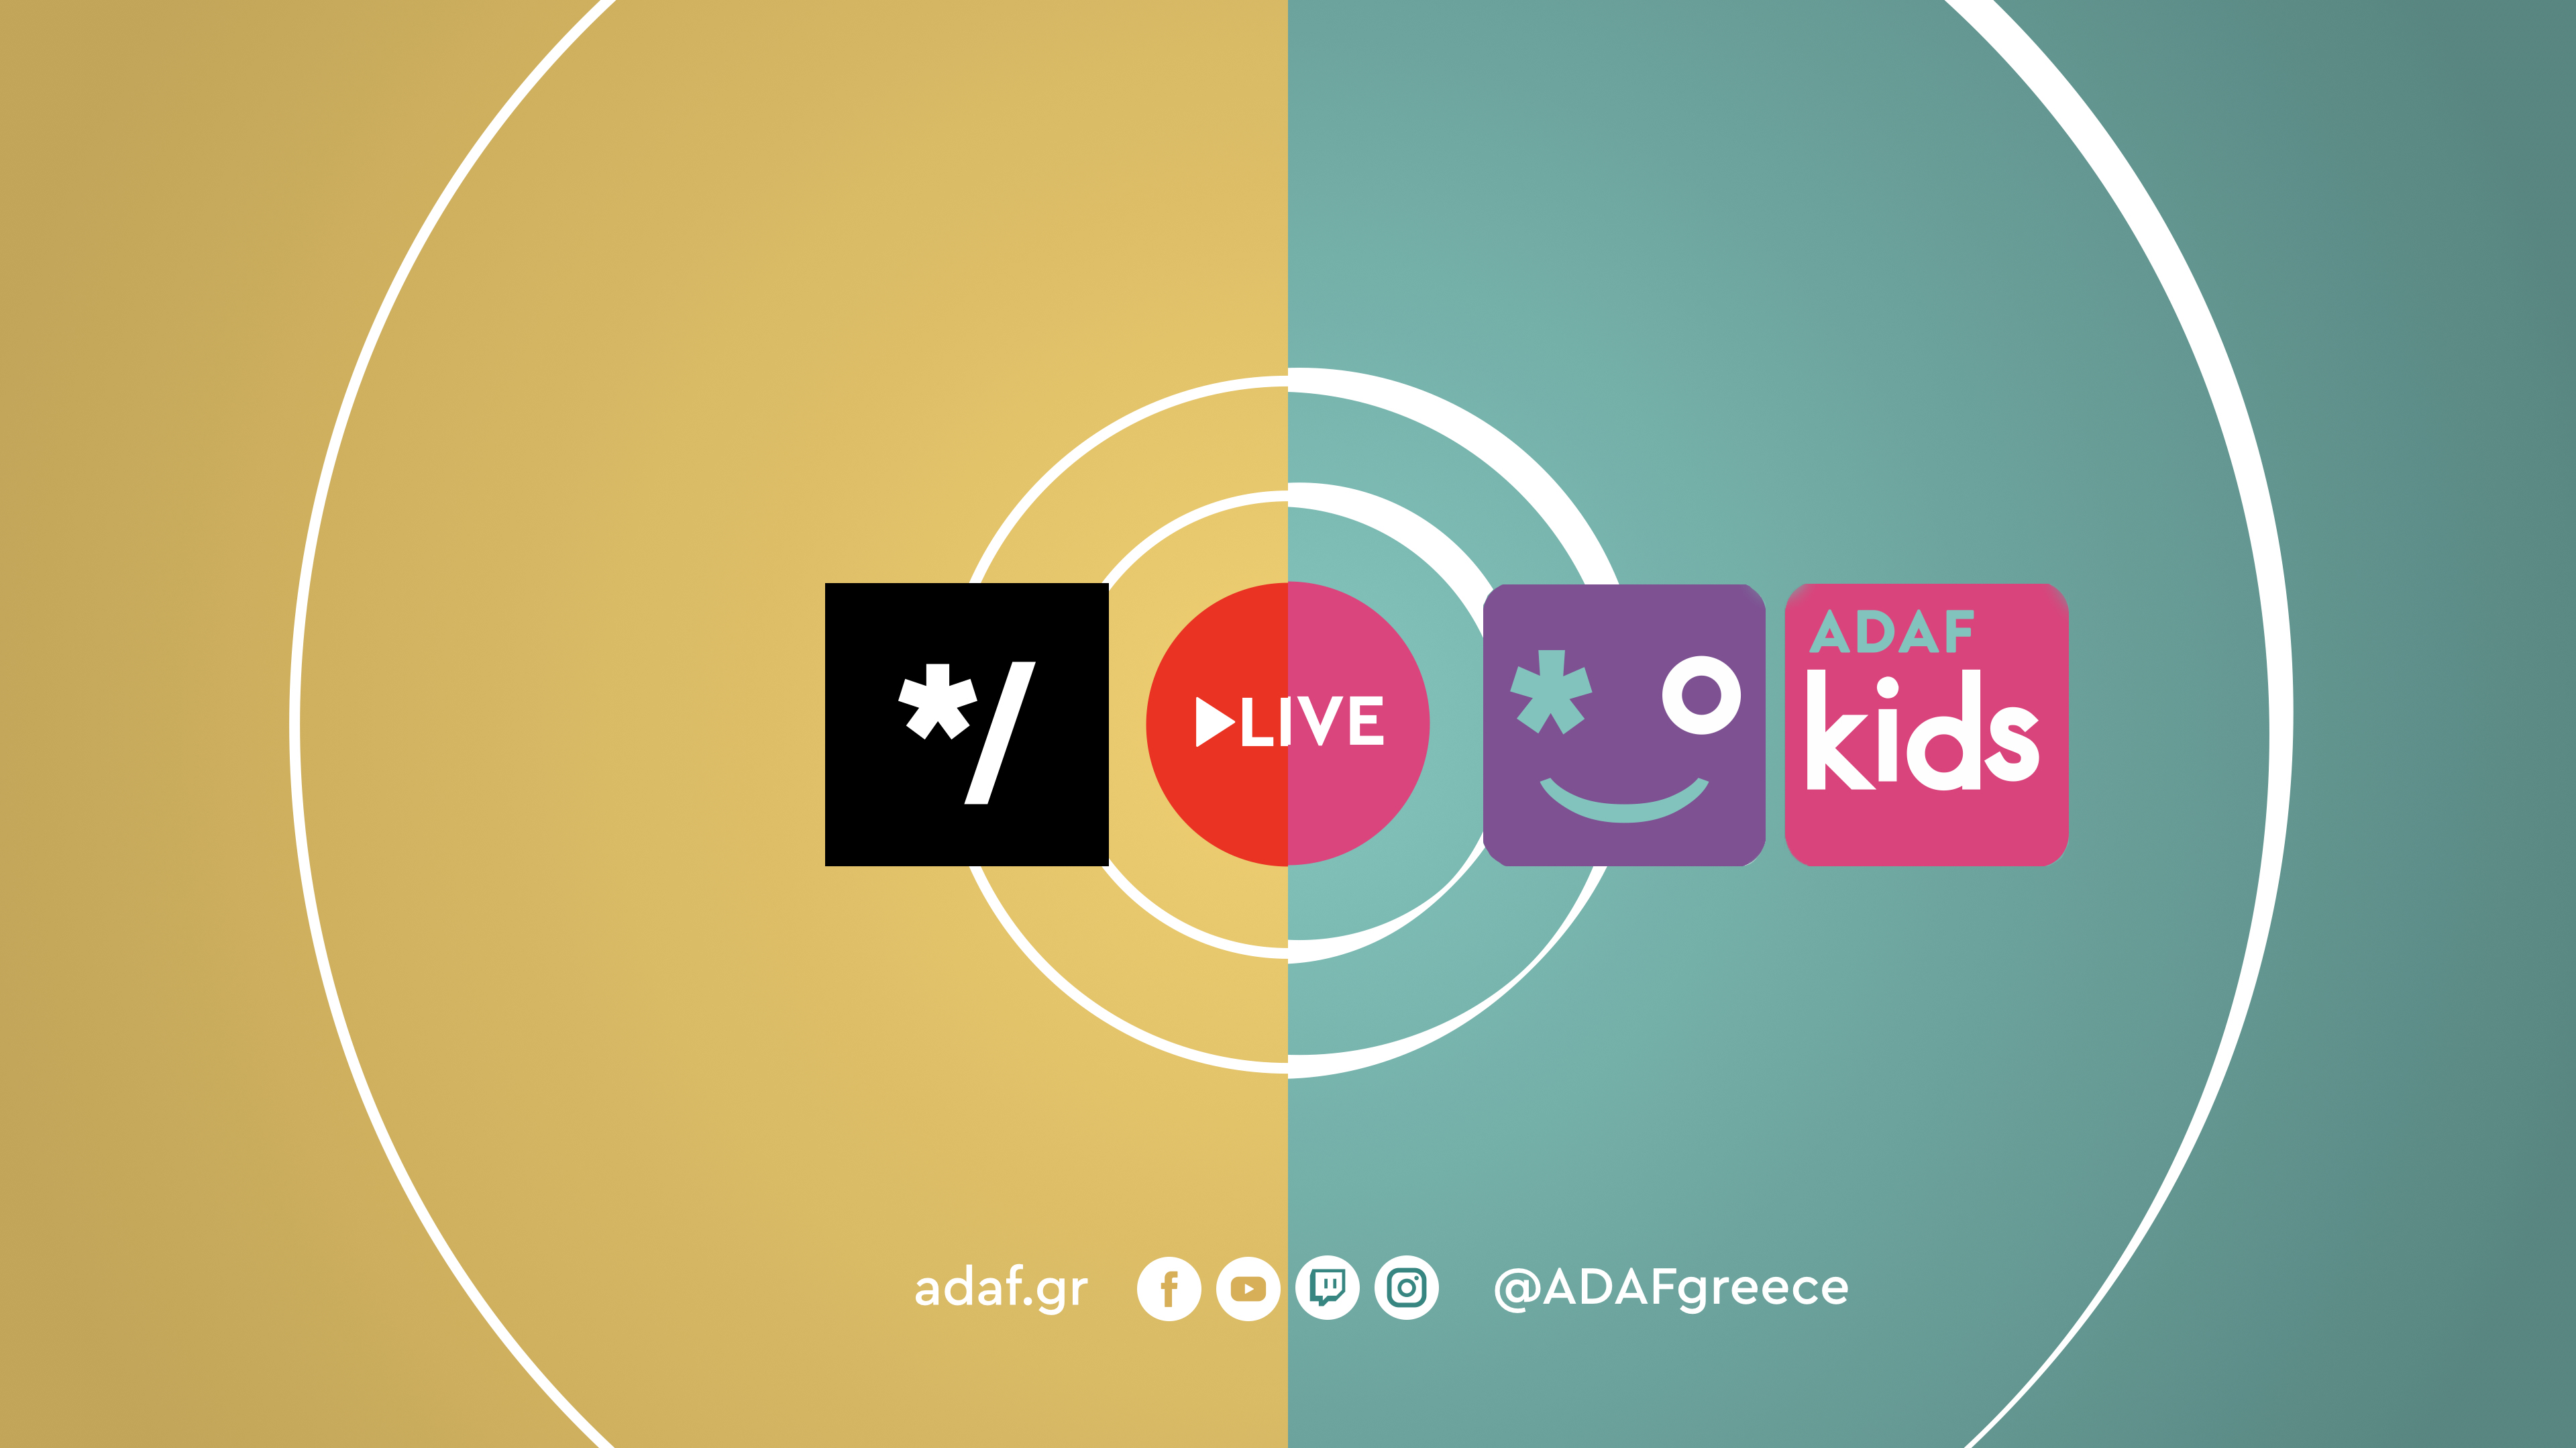 ADAF Live | ADAF Kids Live